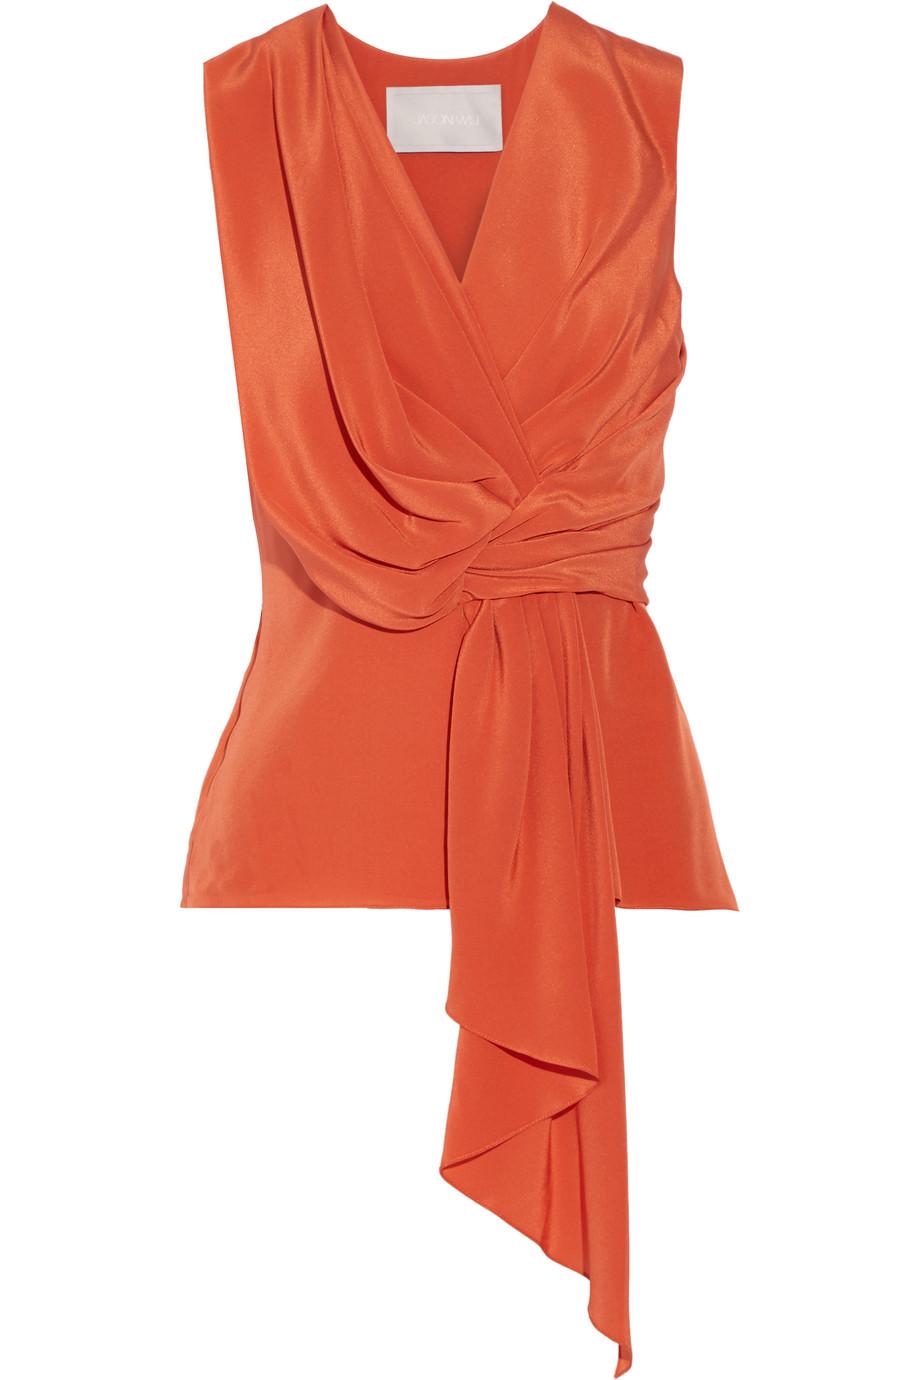 Jason Wu Draped Silk Crepe De Chine Top, Bright Orange, Women's, Size: 6